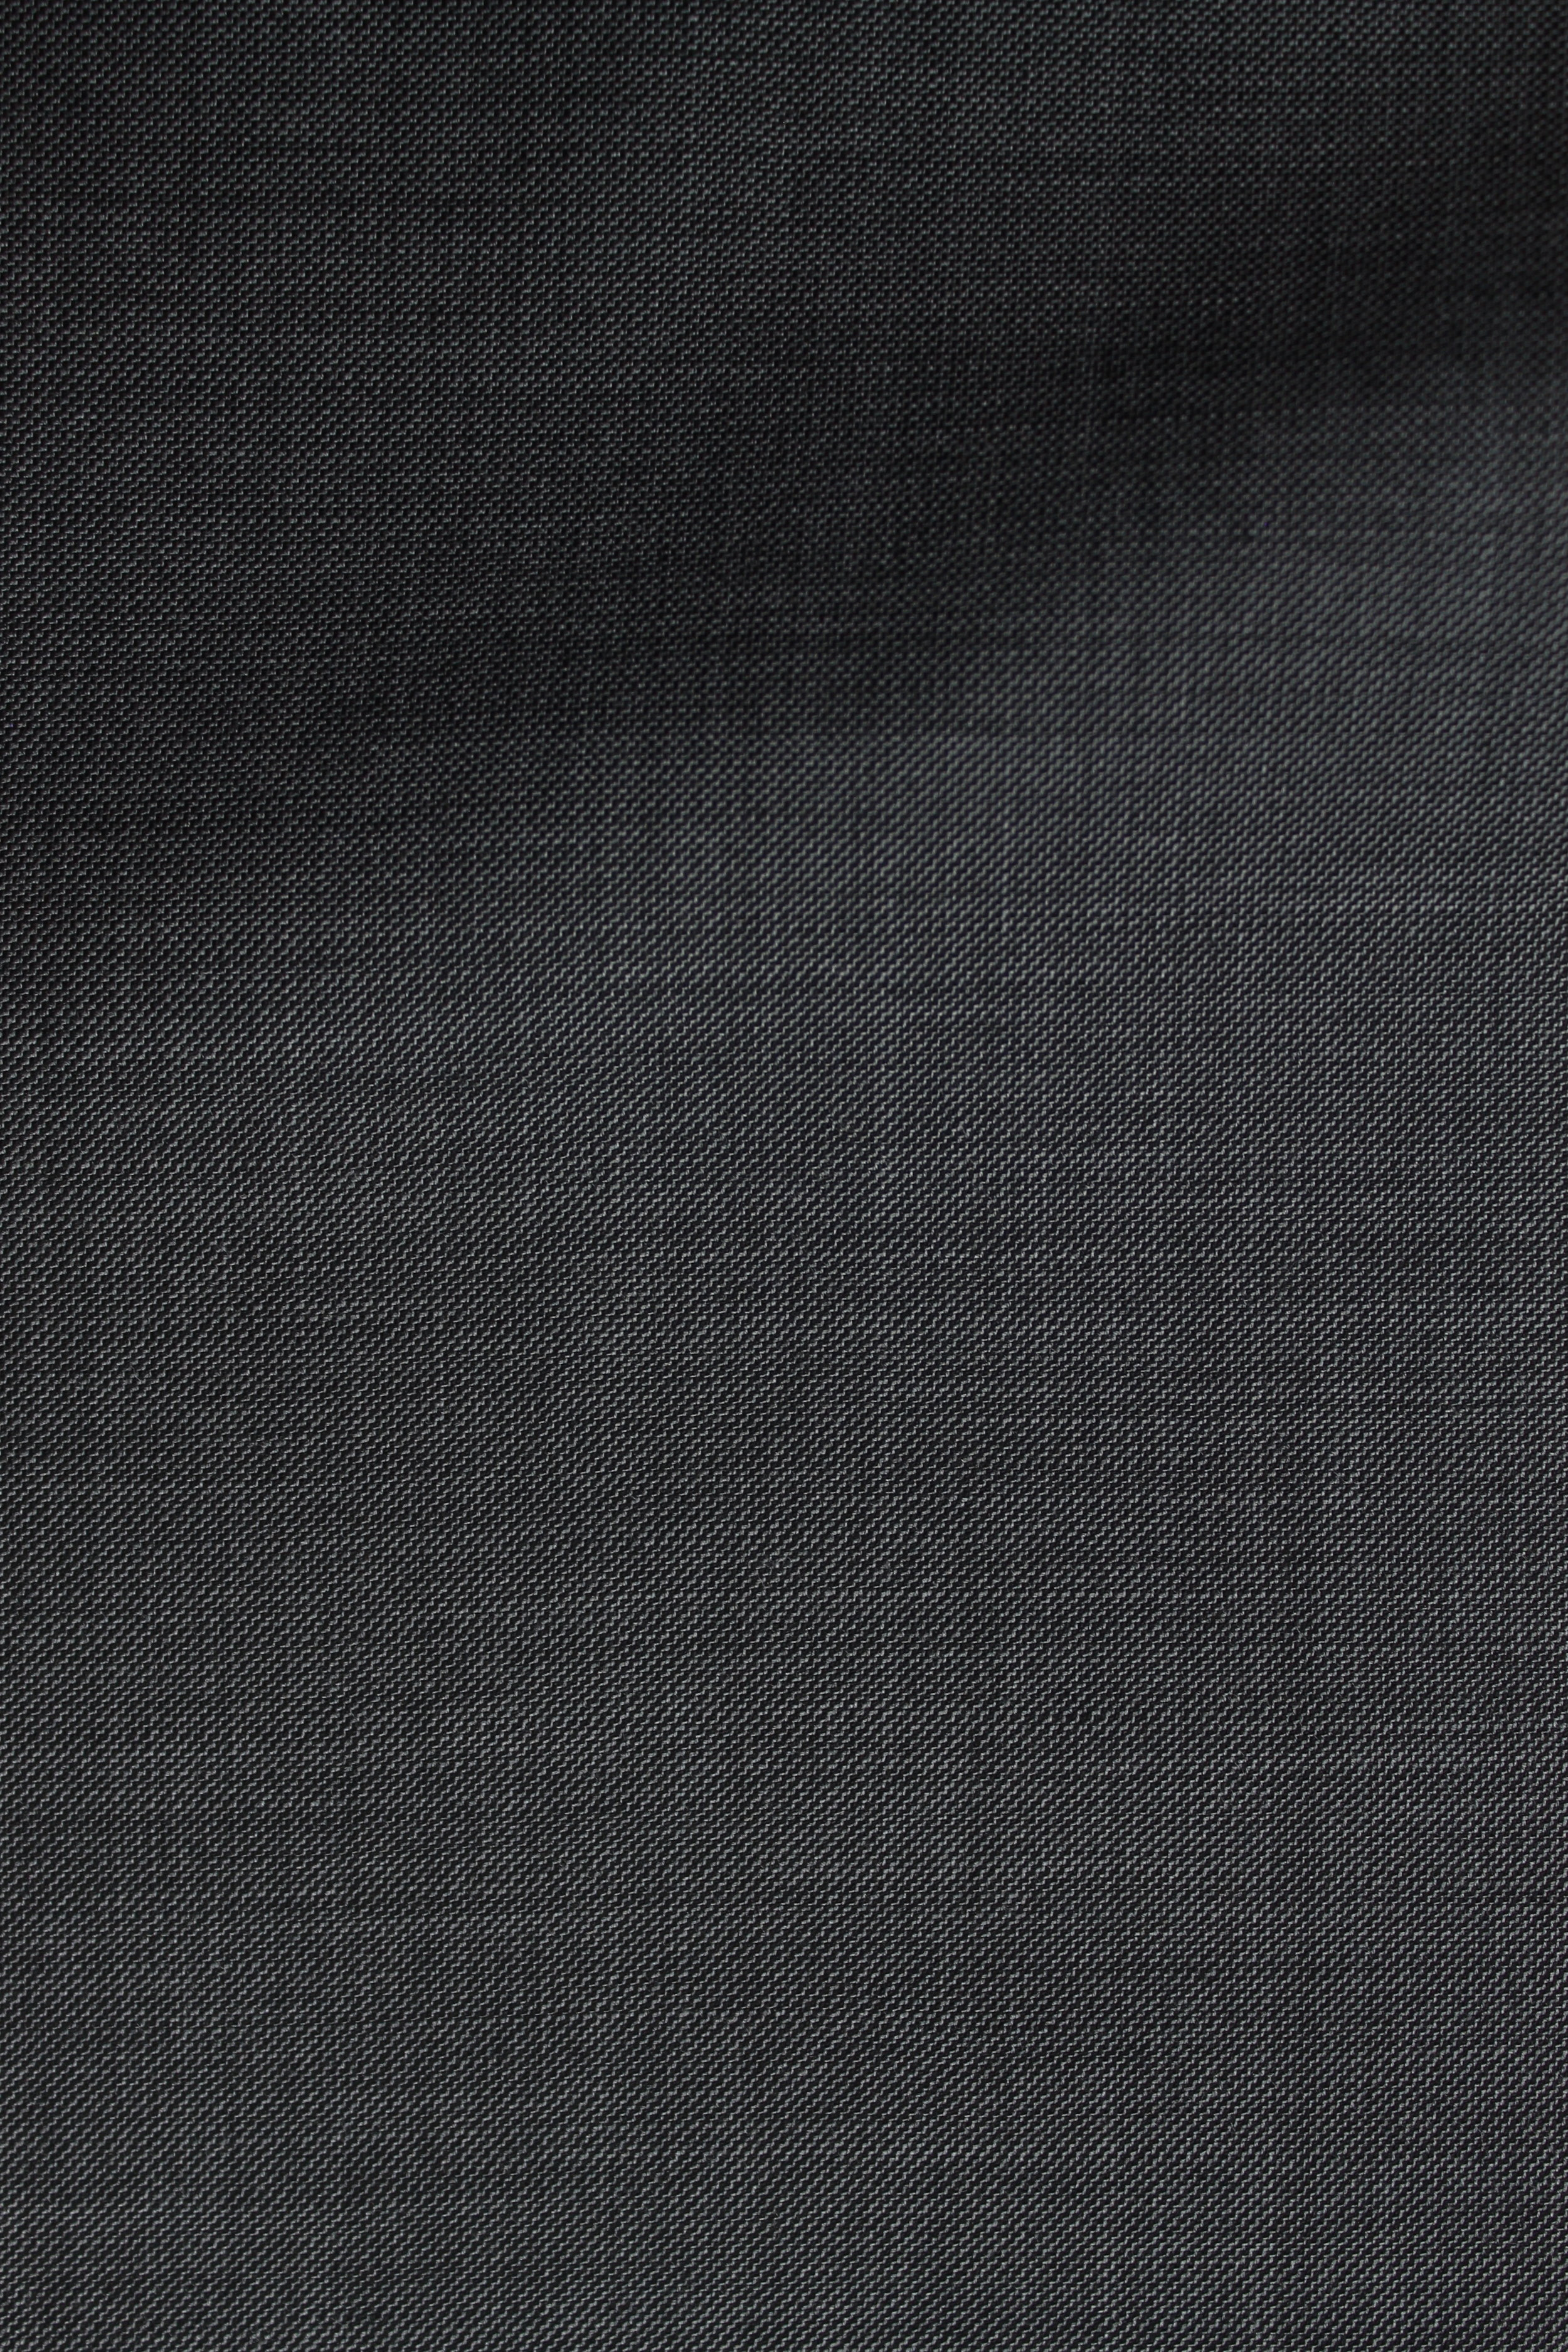 7612 Grey Nailshead Twill 280g.JPG